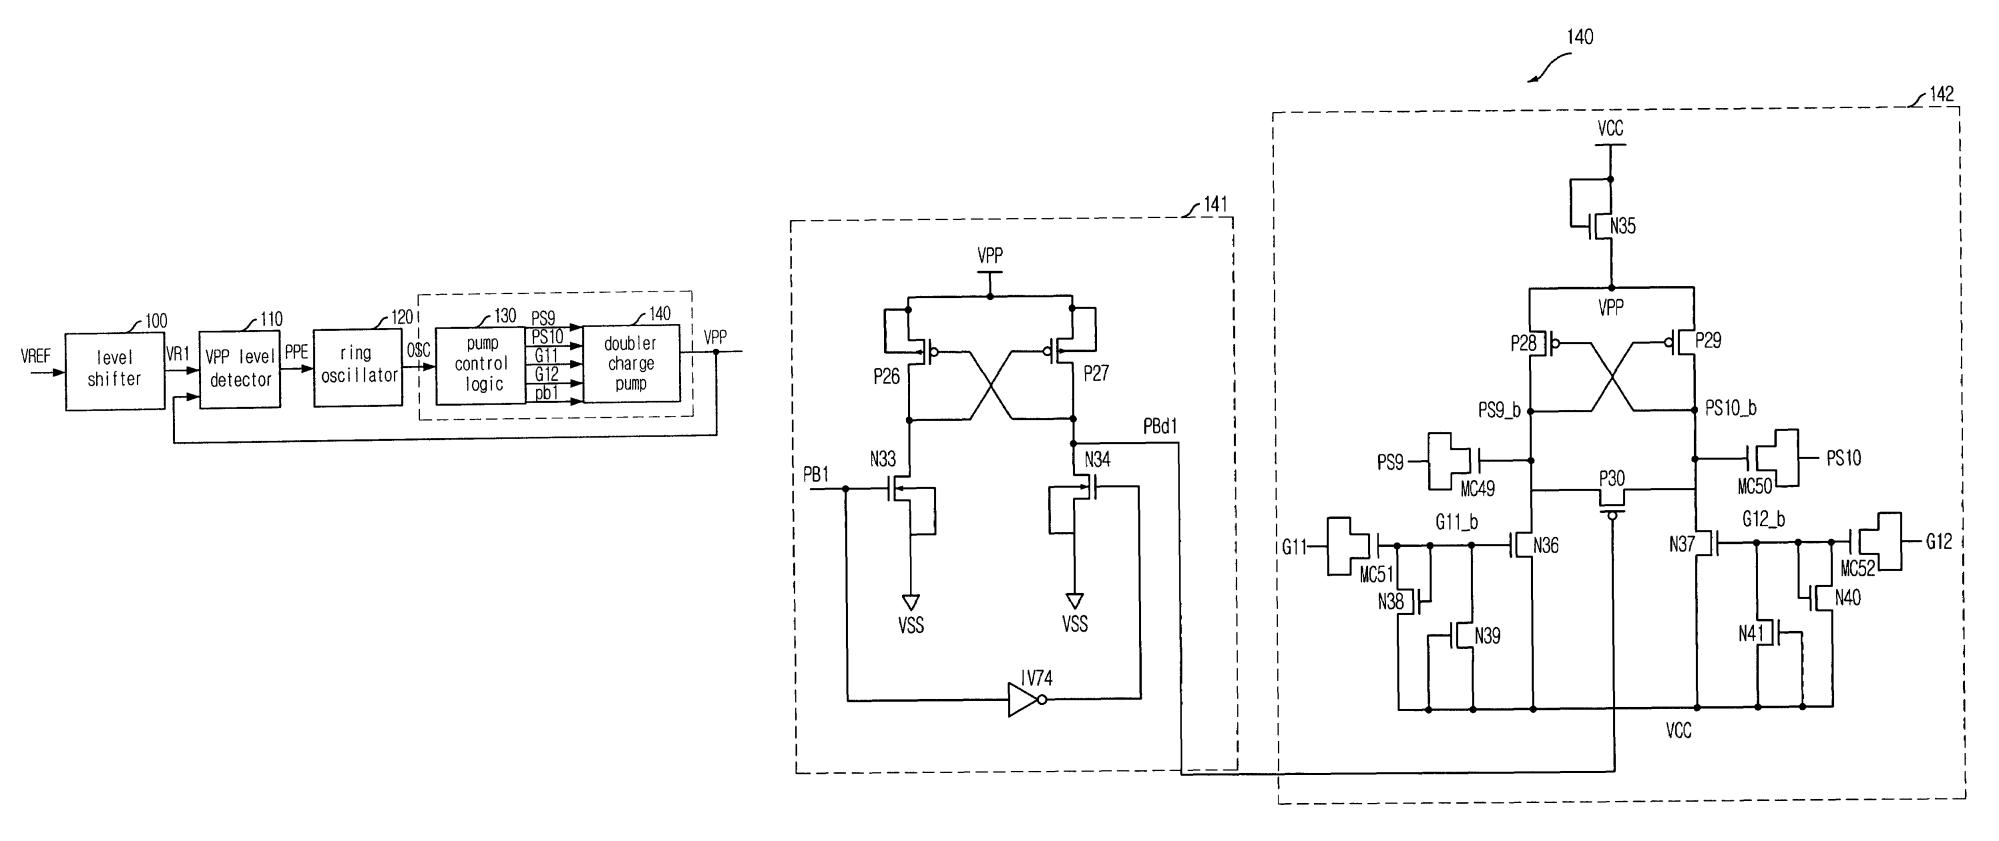 hight resolution of generator mc38 wiring diagram simple wiring post simple motor wiring diagram generator mc38 wiring diagram